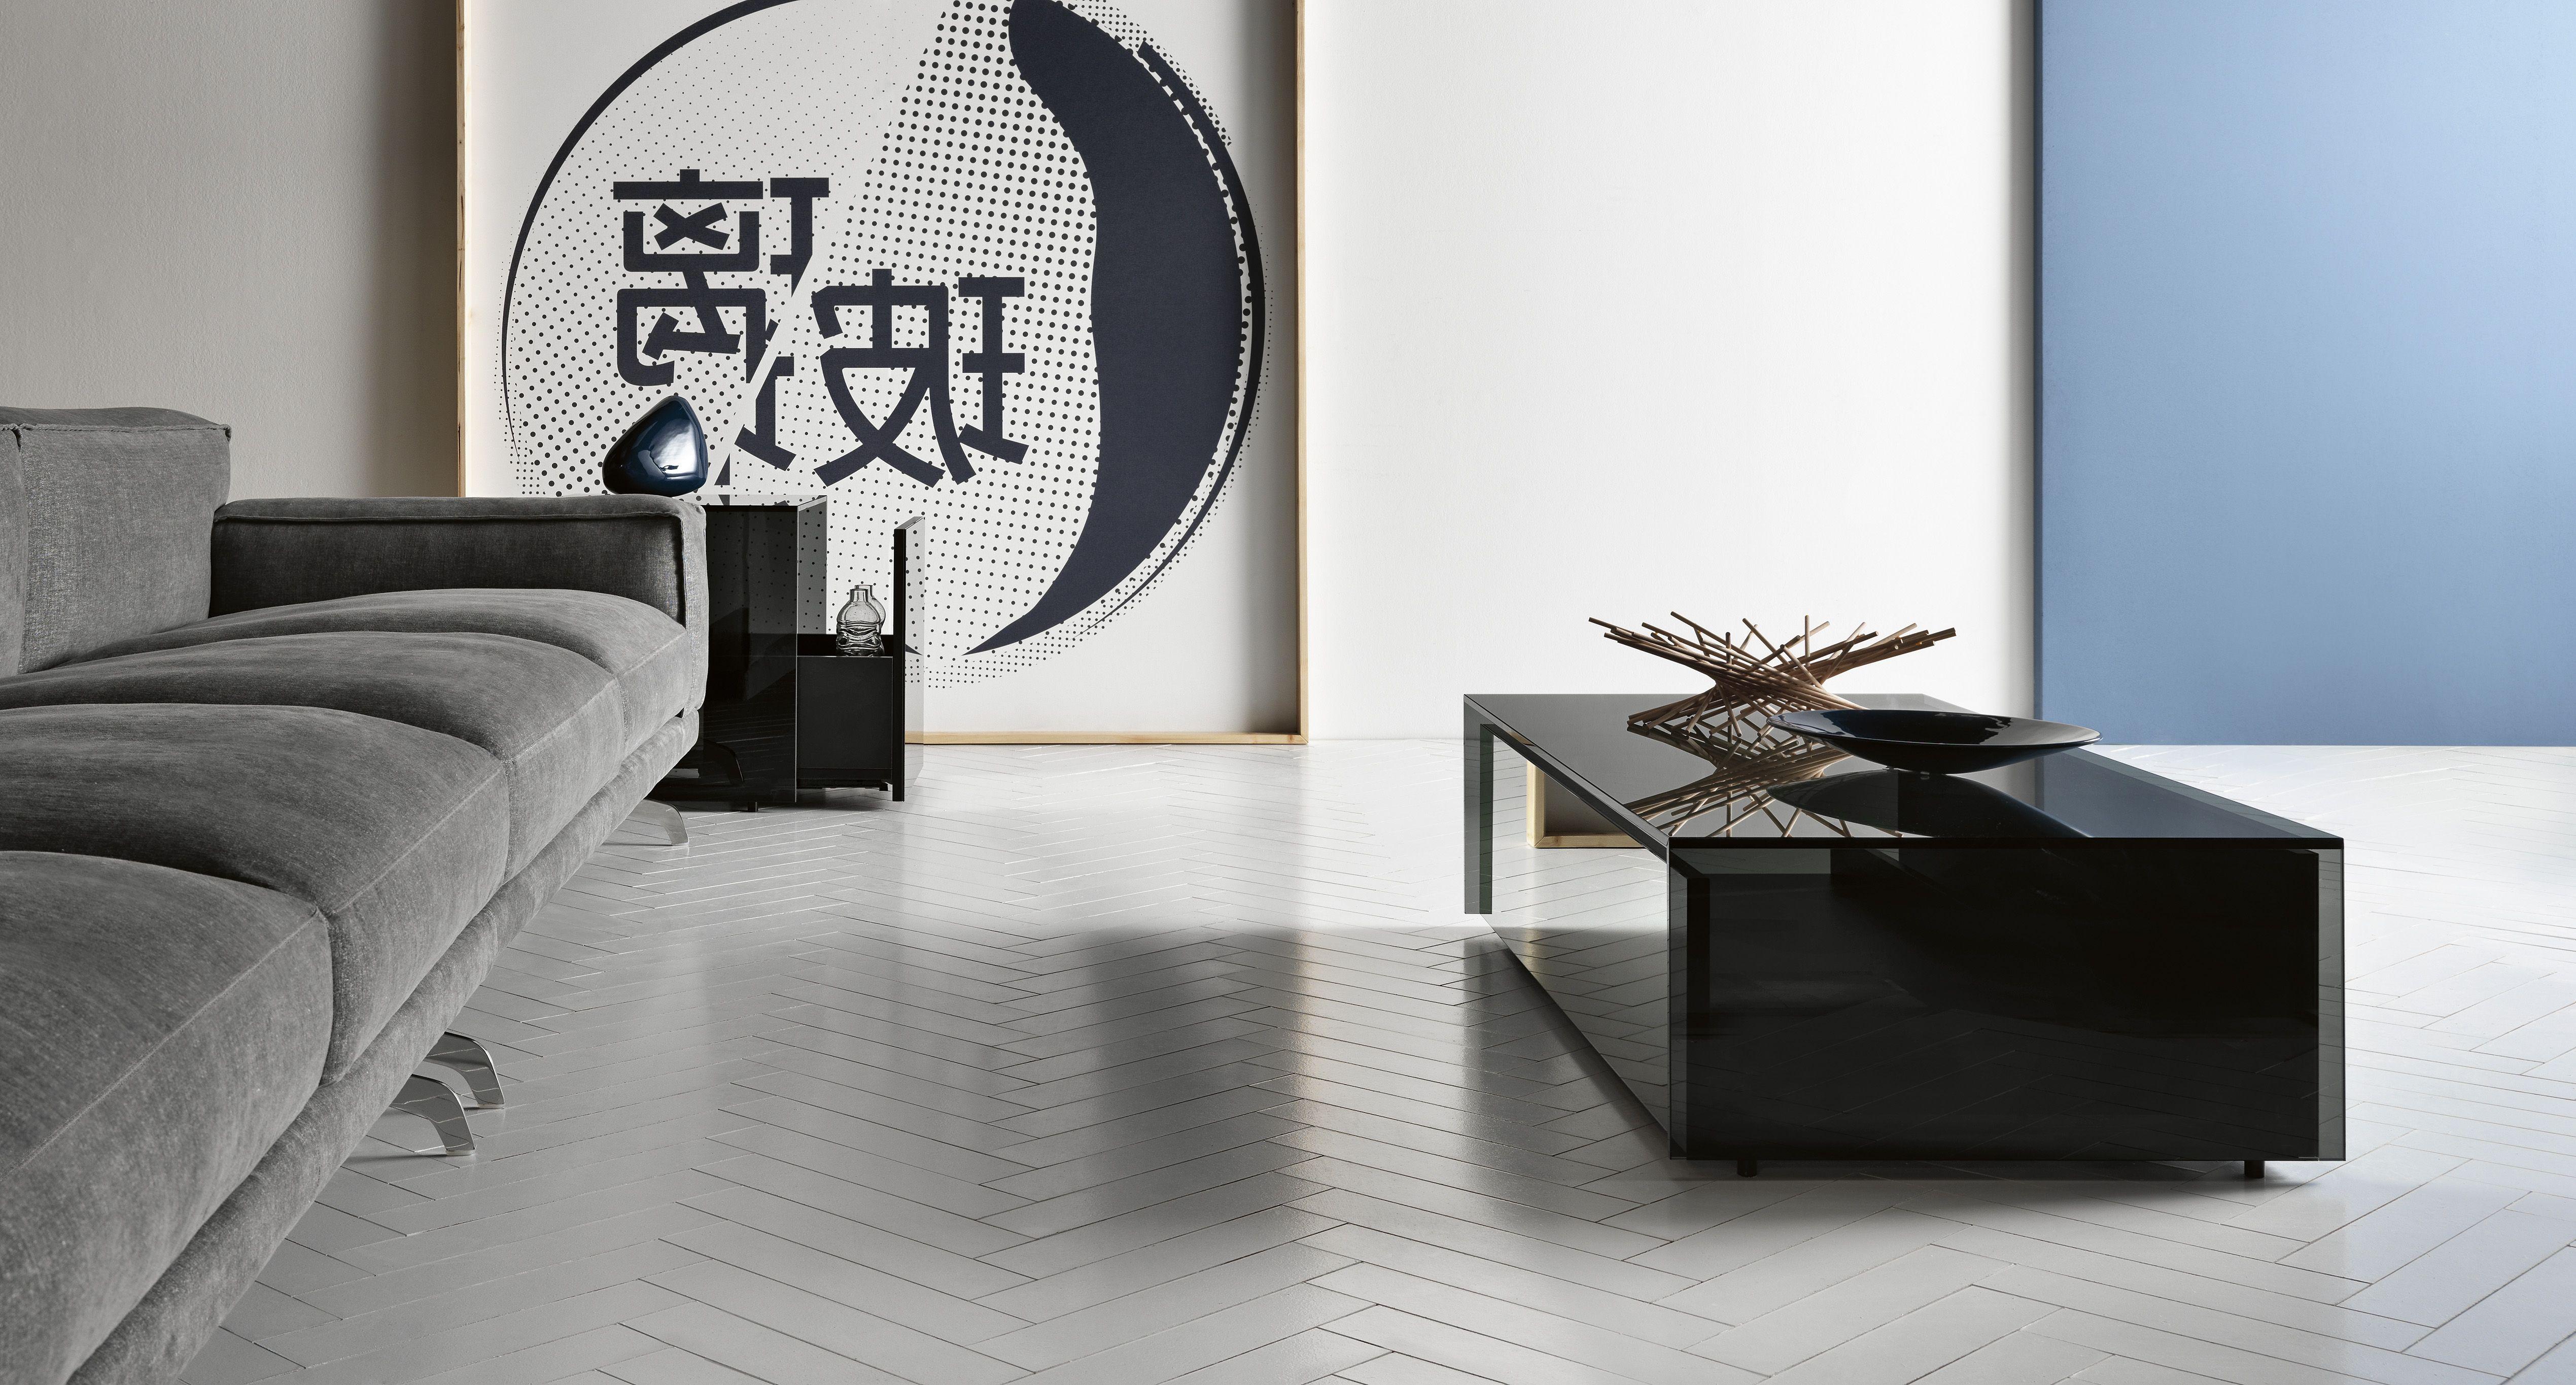 GOTHAM design Leonardi_Marinelli for Tonelli design. Smoked glass ...